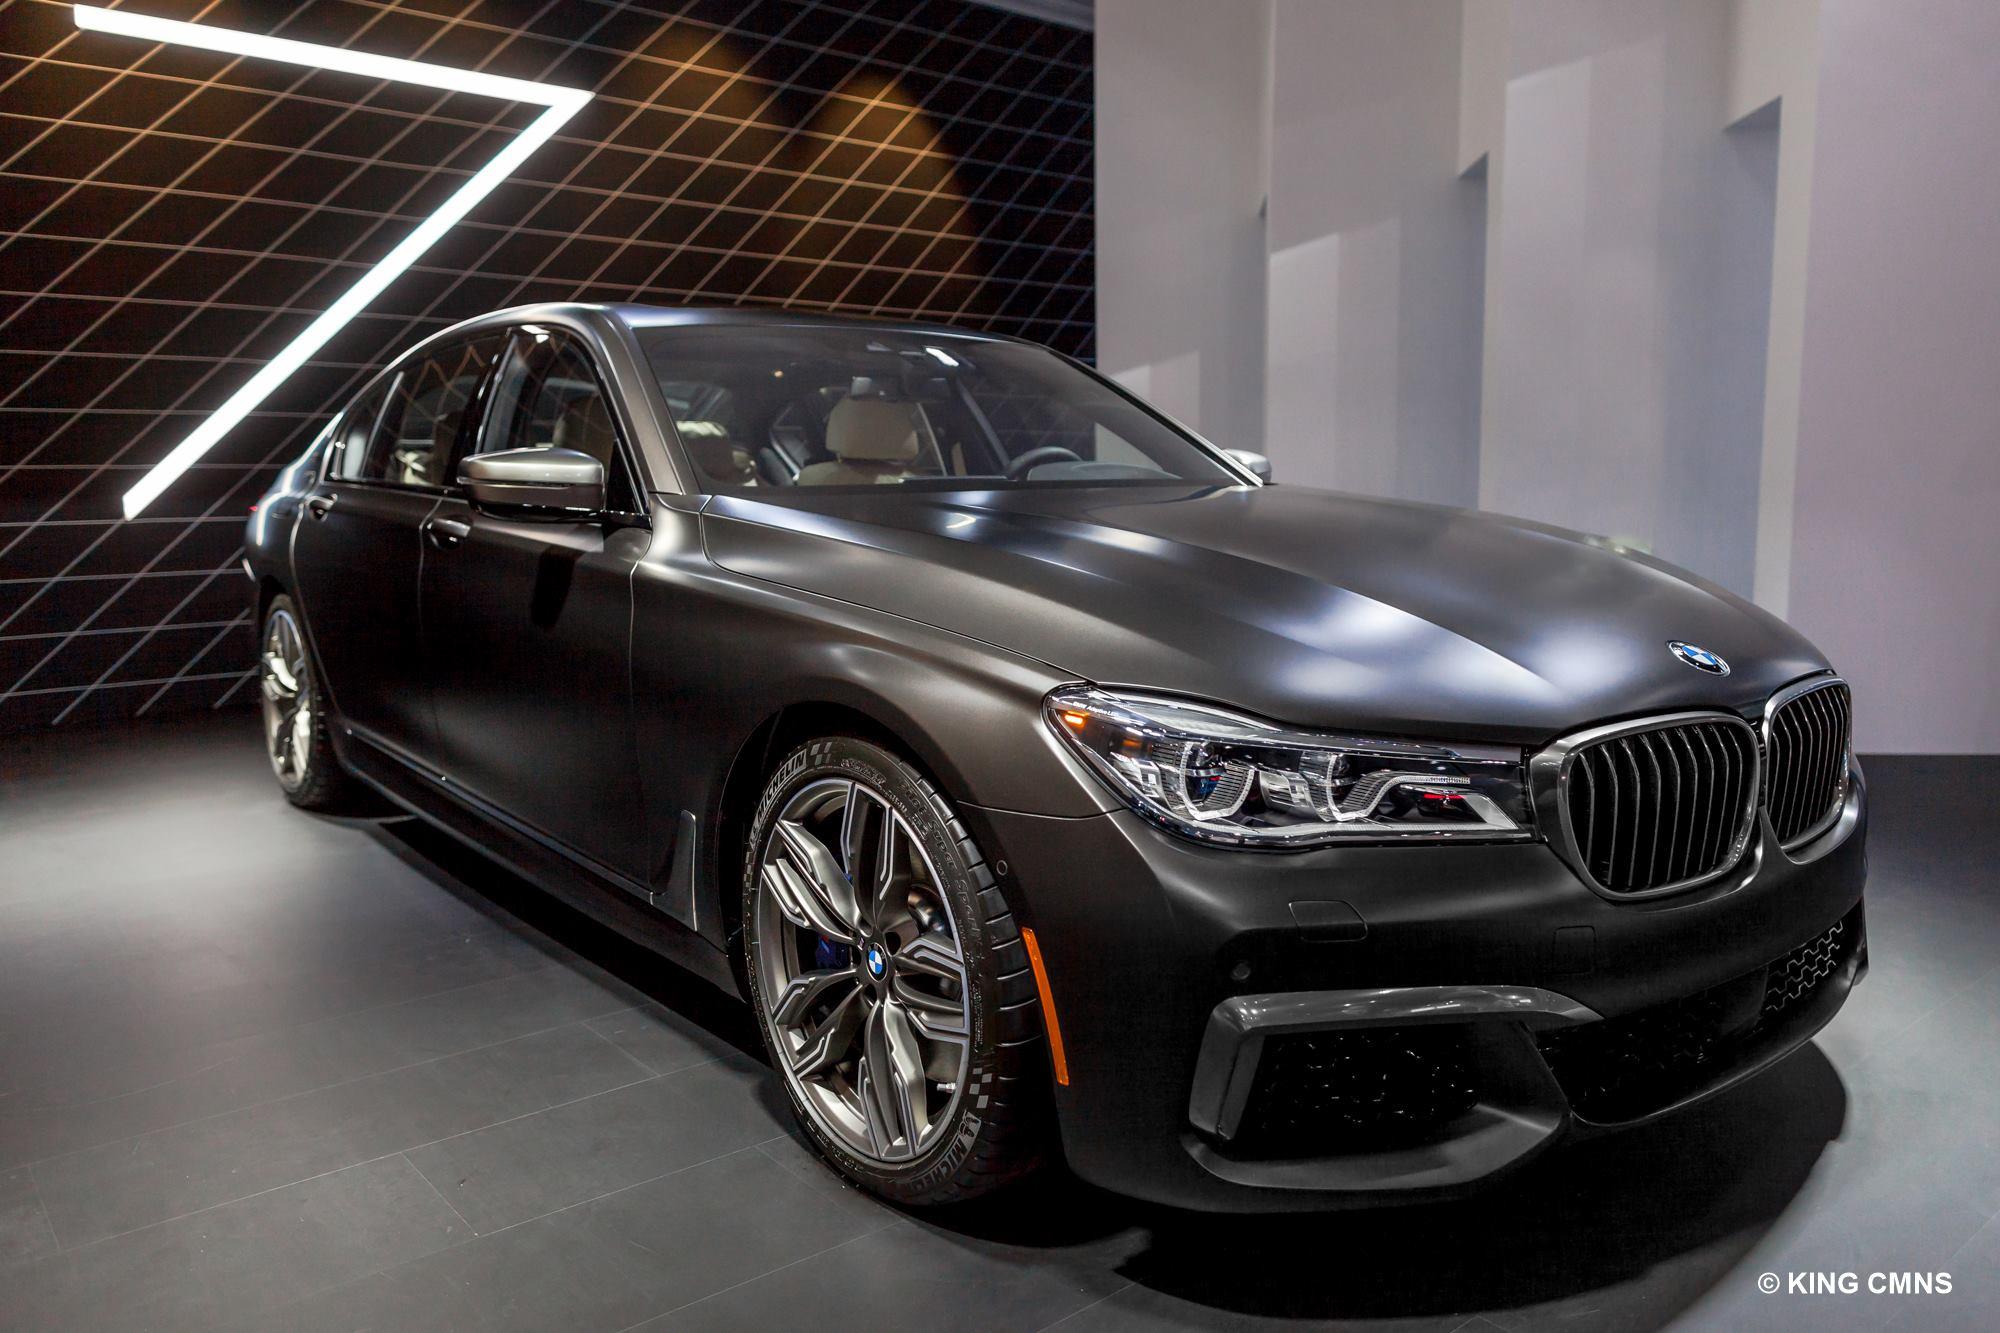 2016 BMW M760Li image 1